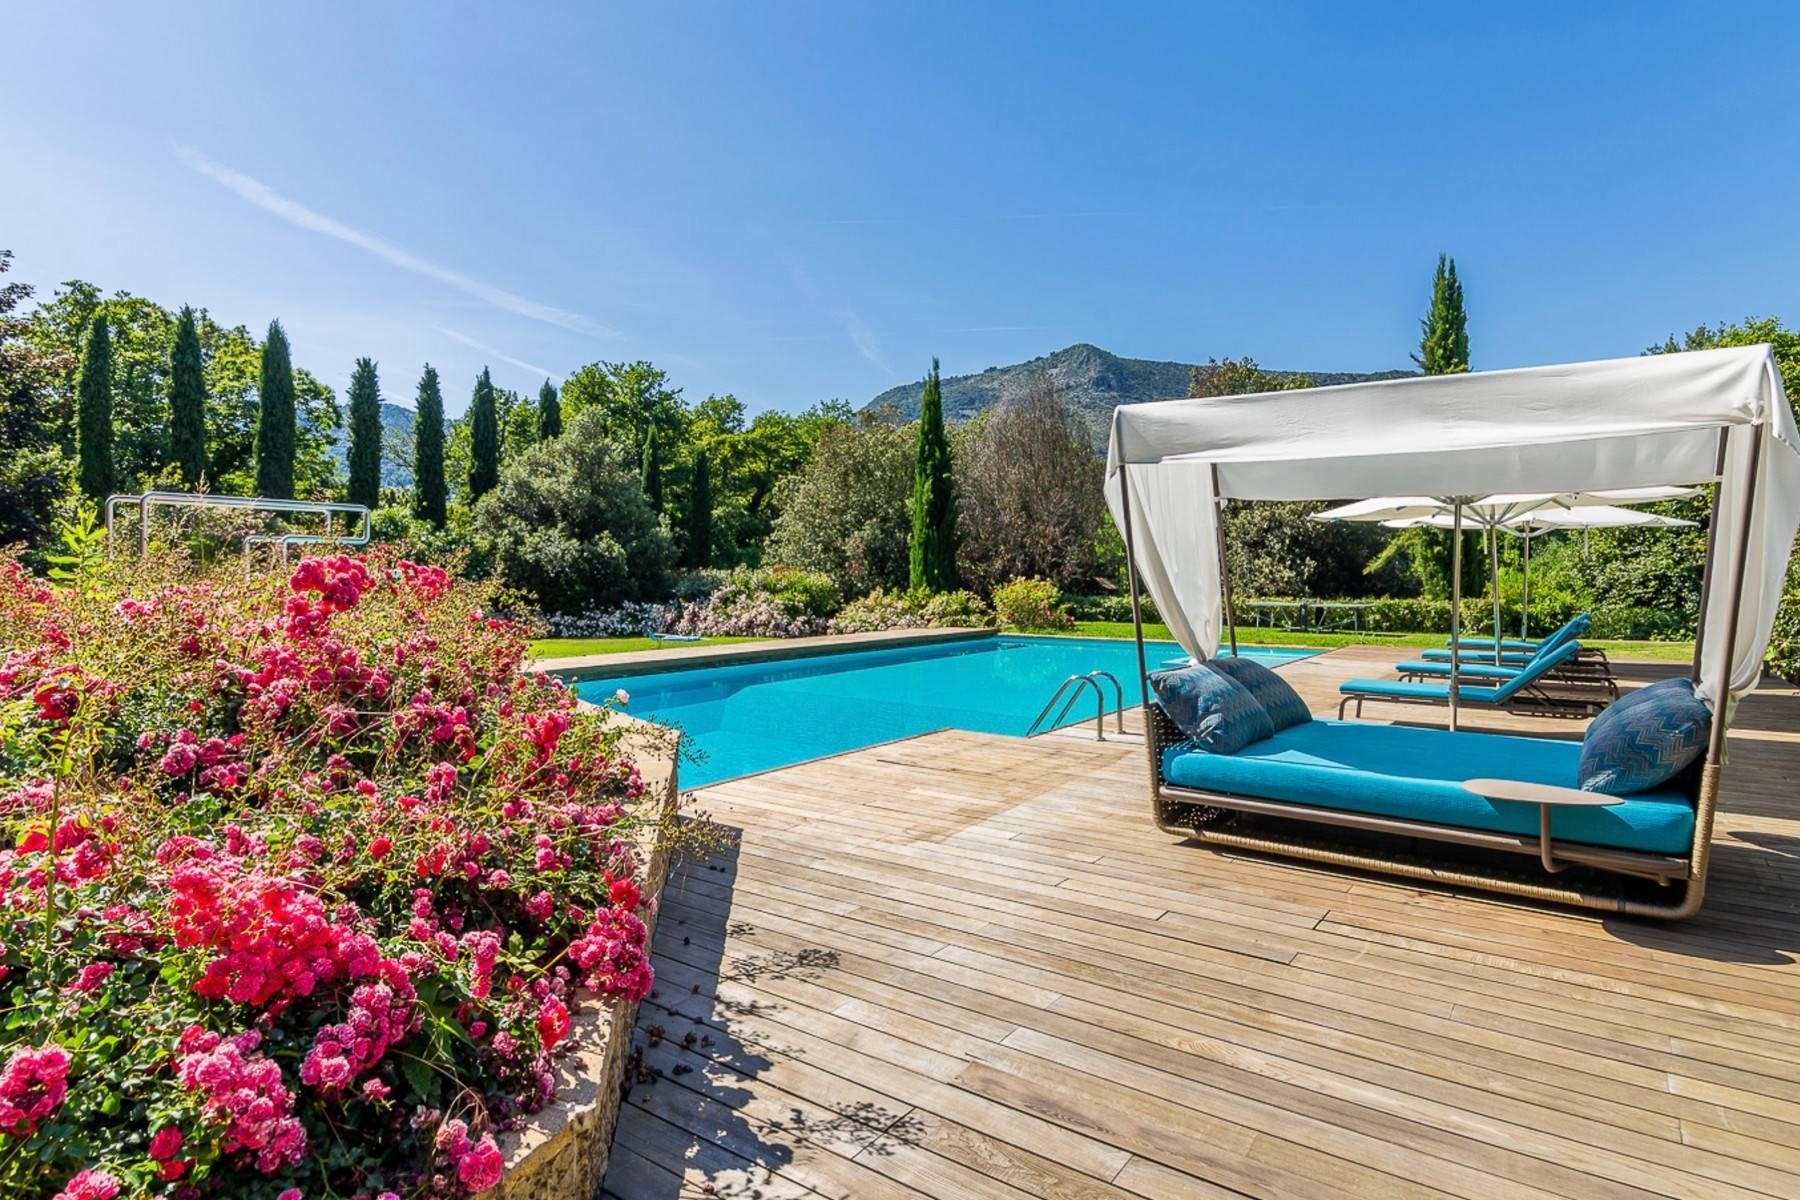 Villa in Vendita a Lucca: 5 locali, 1130 mq - Foto 29